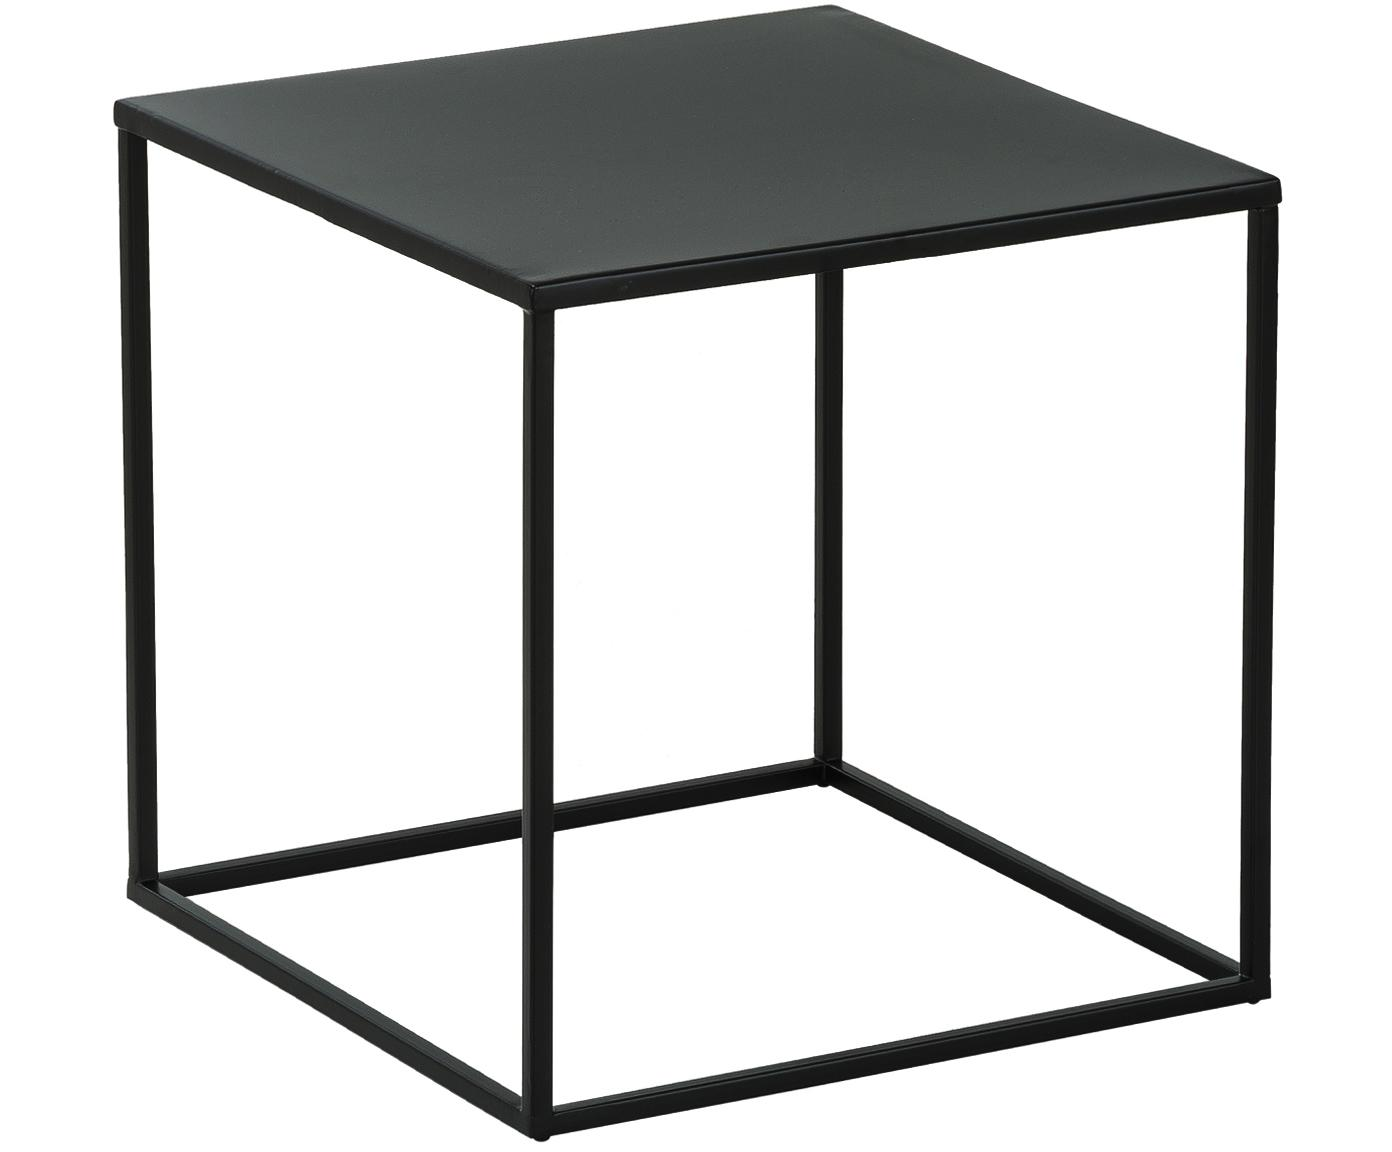 Beistelltisch Stina aus Metall, Metall, pulverbeschichtet, Schwarz, matt, 45 x 45 cm